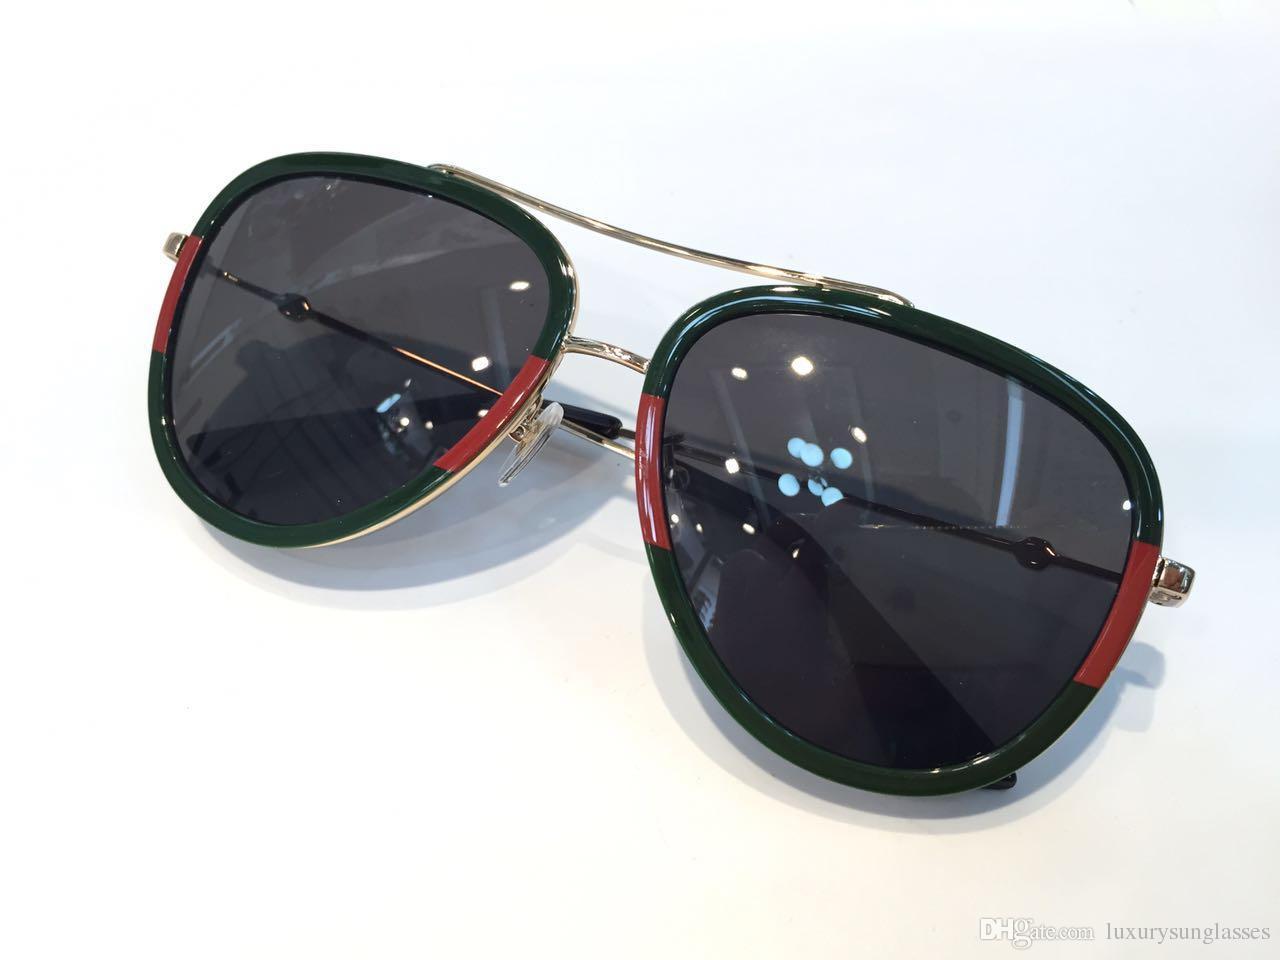 2acf3eb2f6aa Luxury Designer Sunglasses For Women 0062 Classic Summer Fashion Style  Metal Frame Eye Glasses Top Quality Eyewear UV Protection Lens Sunglasses  Online ...